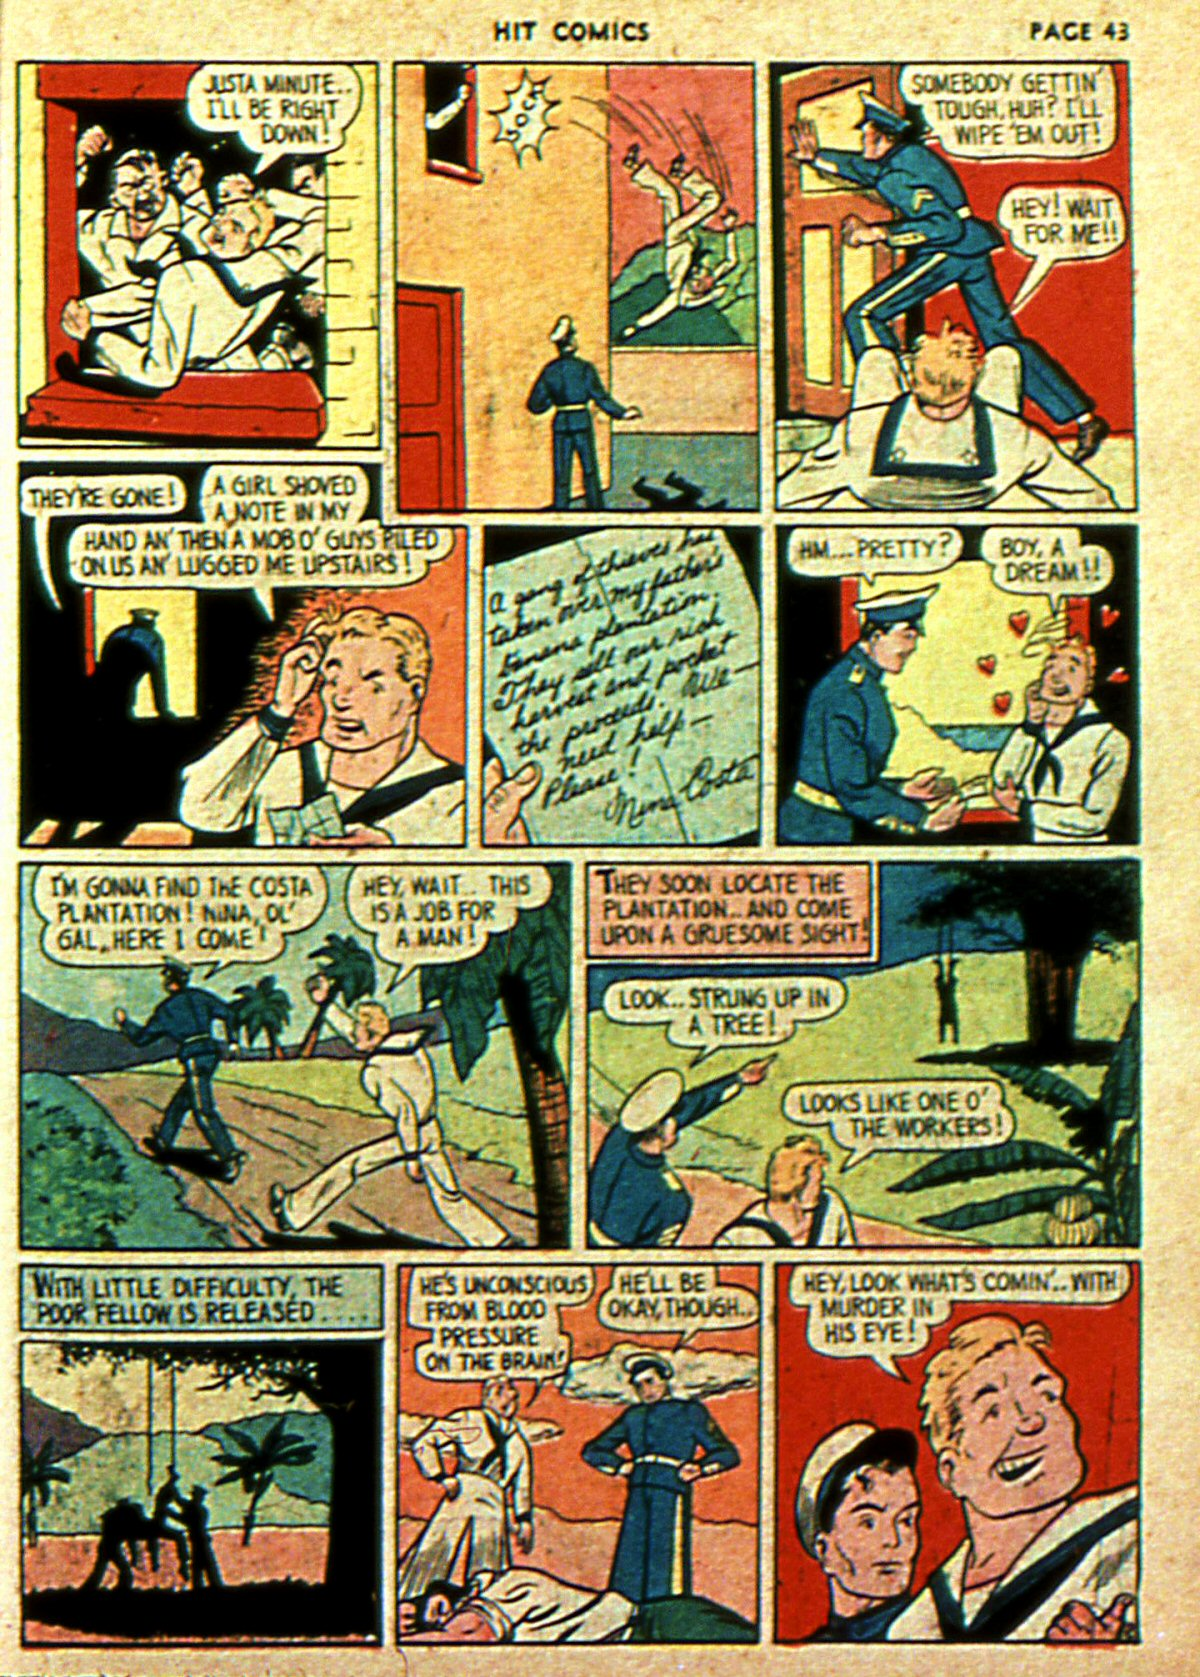 Read online Hit Comics comic -  Issue #2 - 45